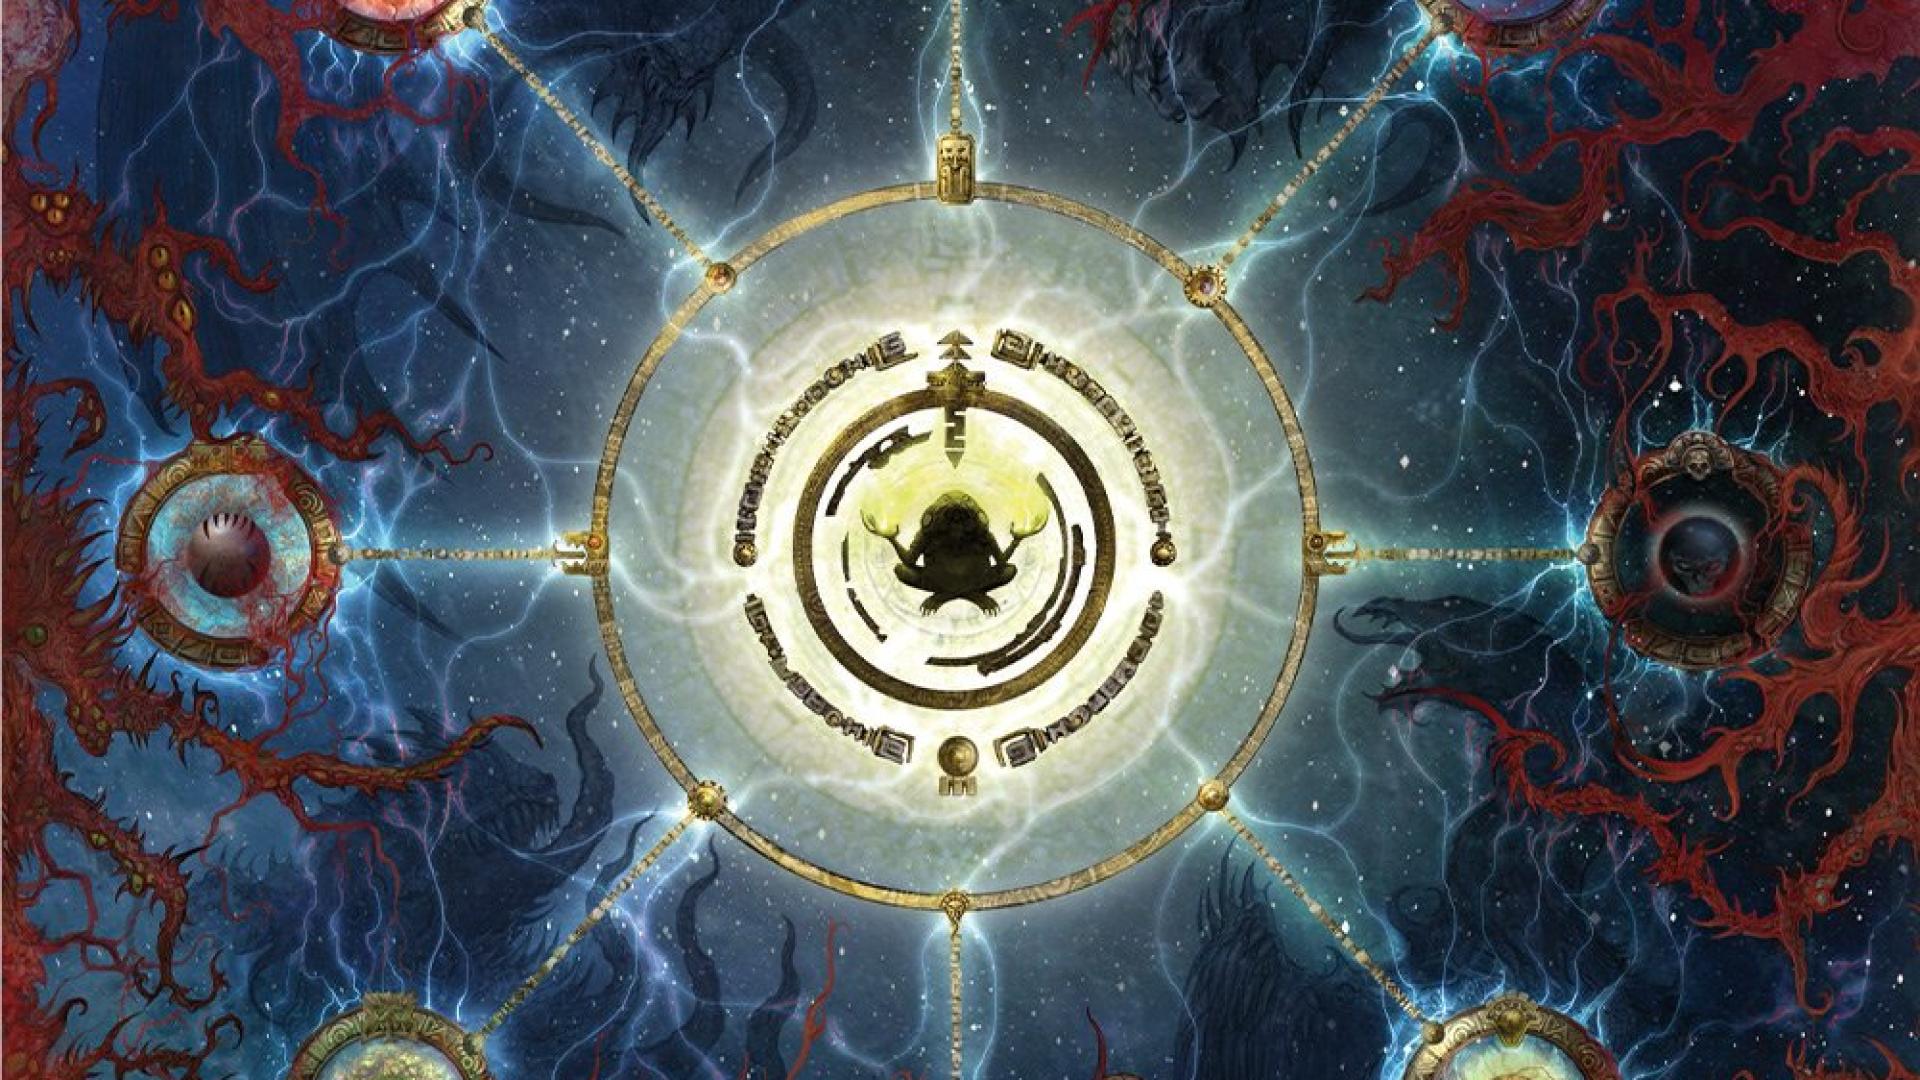 age-of-sigmar-cosmos-key-art.png